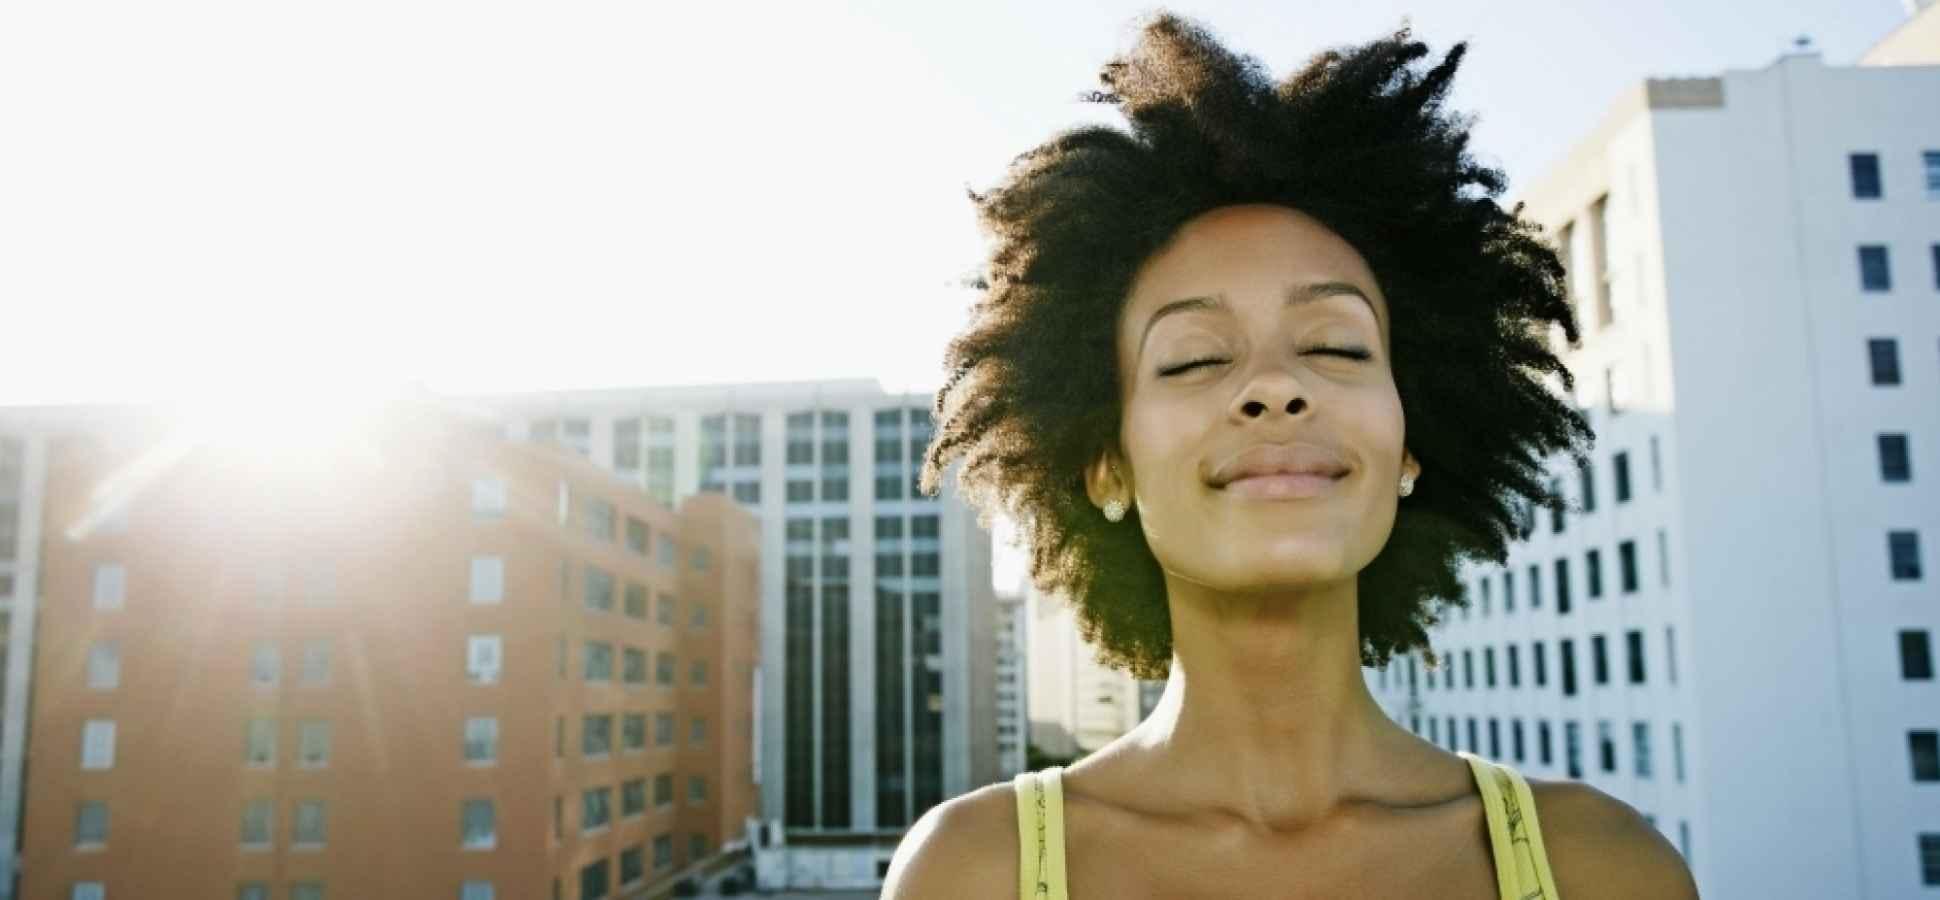 5 Ways Mindfulness Will Turbocharge Your Career | Inc.com